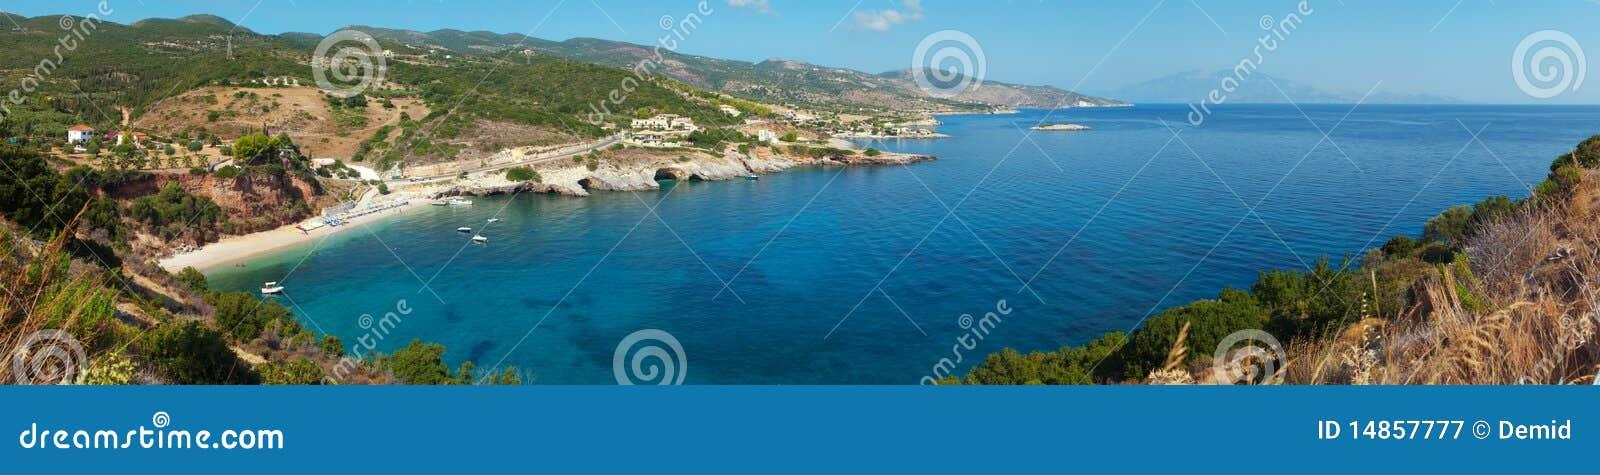 Bay on Mediterranean Island.